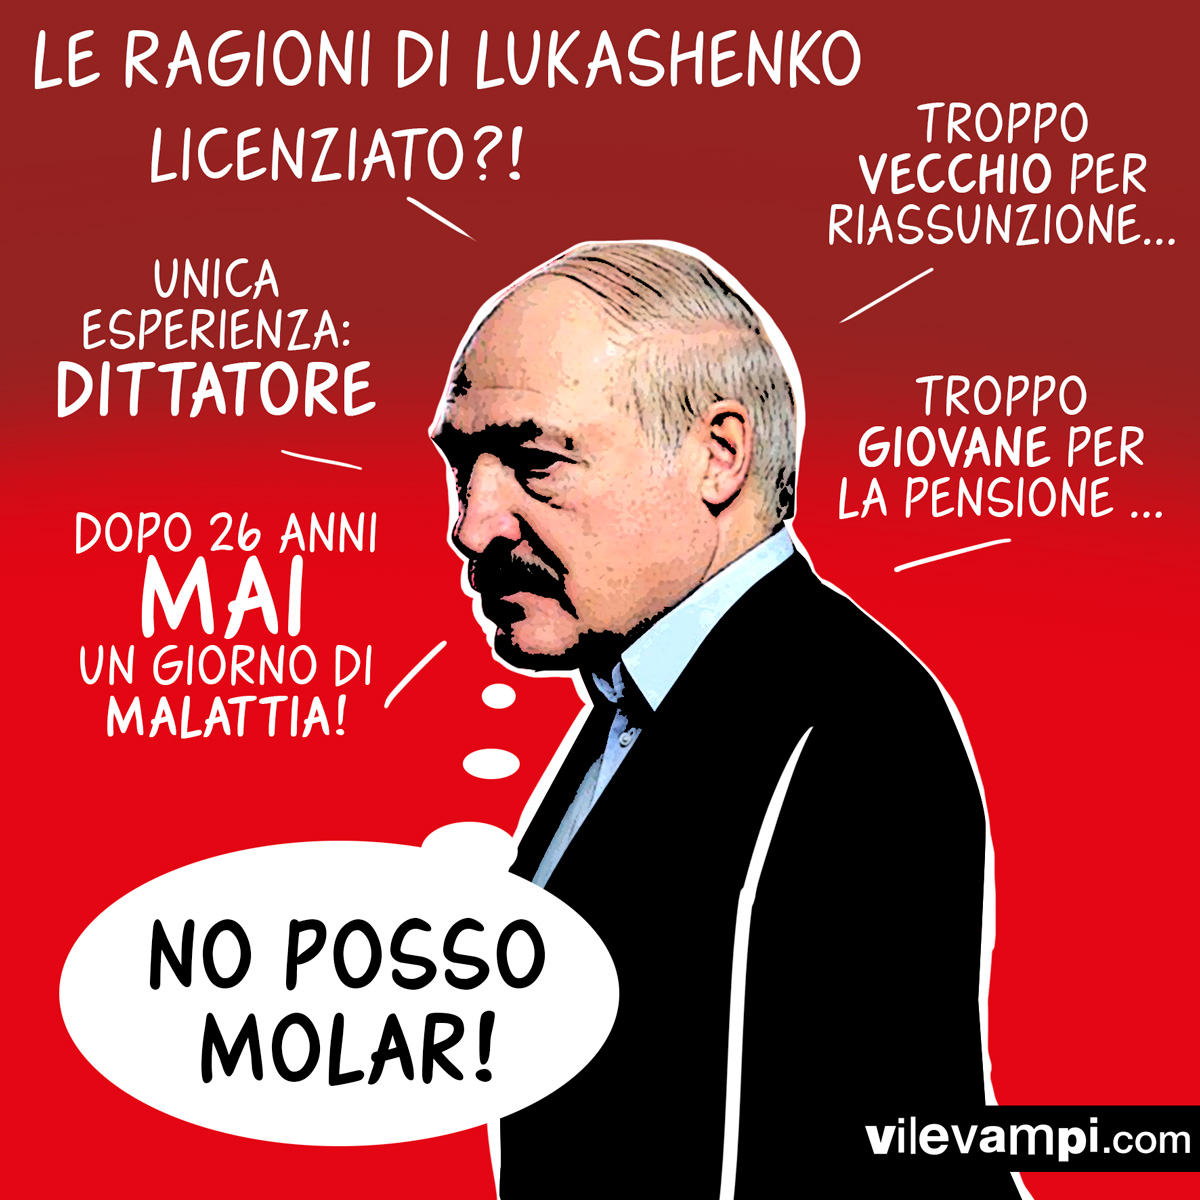 2020_Ragioni_Lukashenko